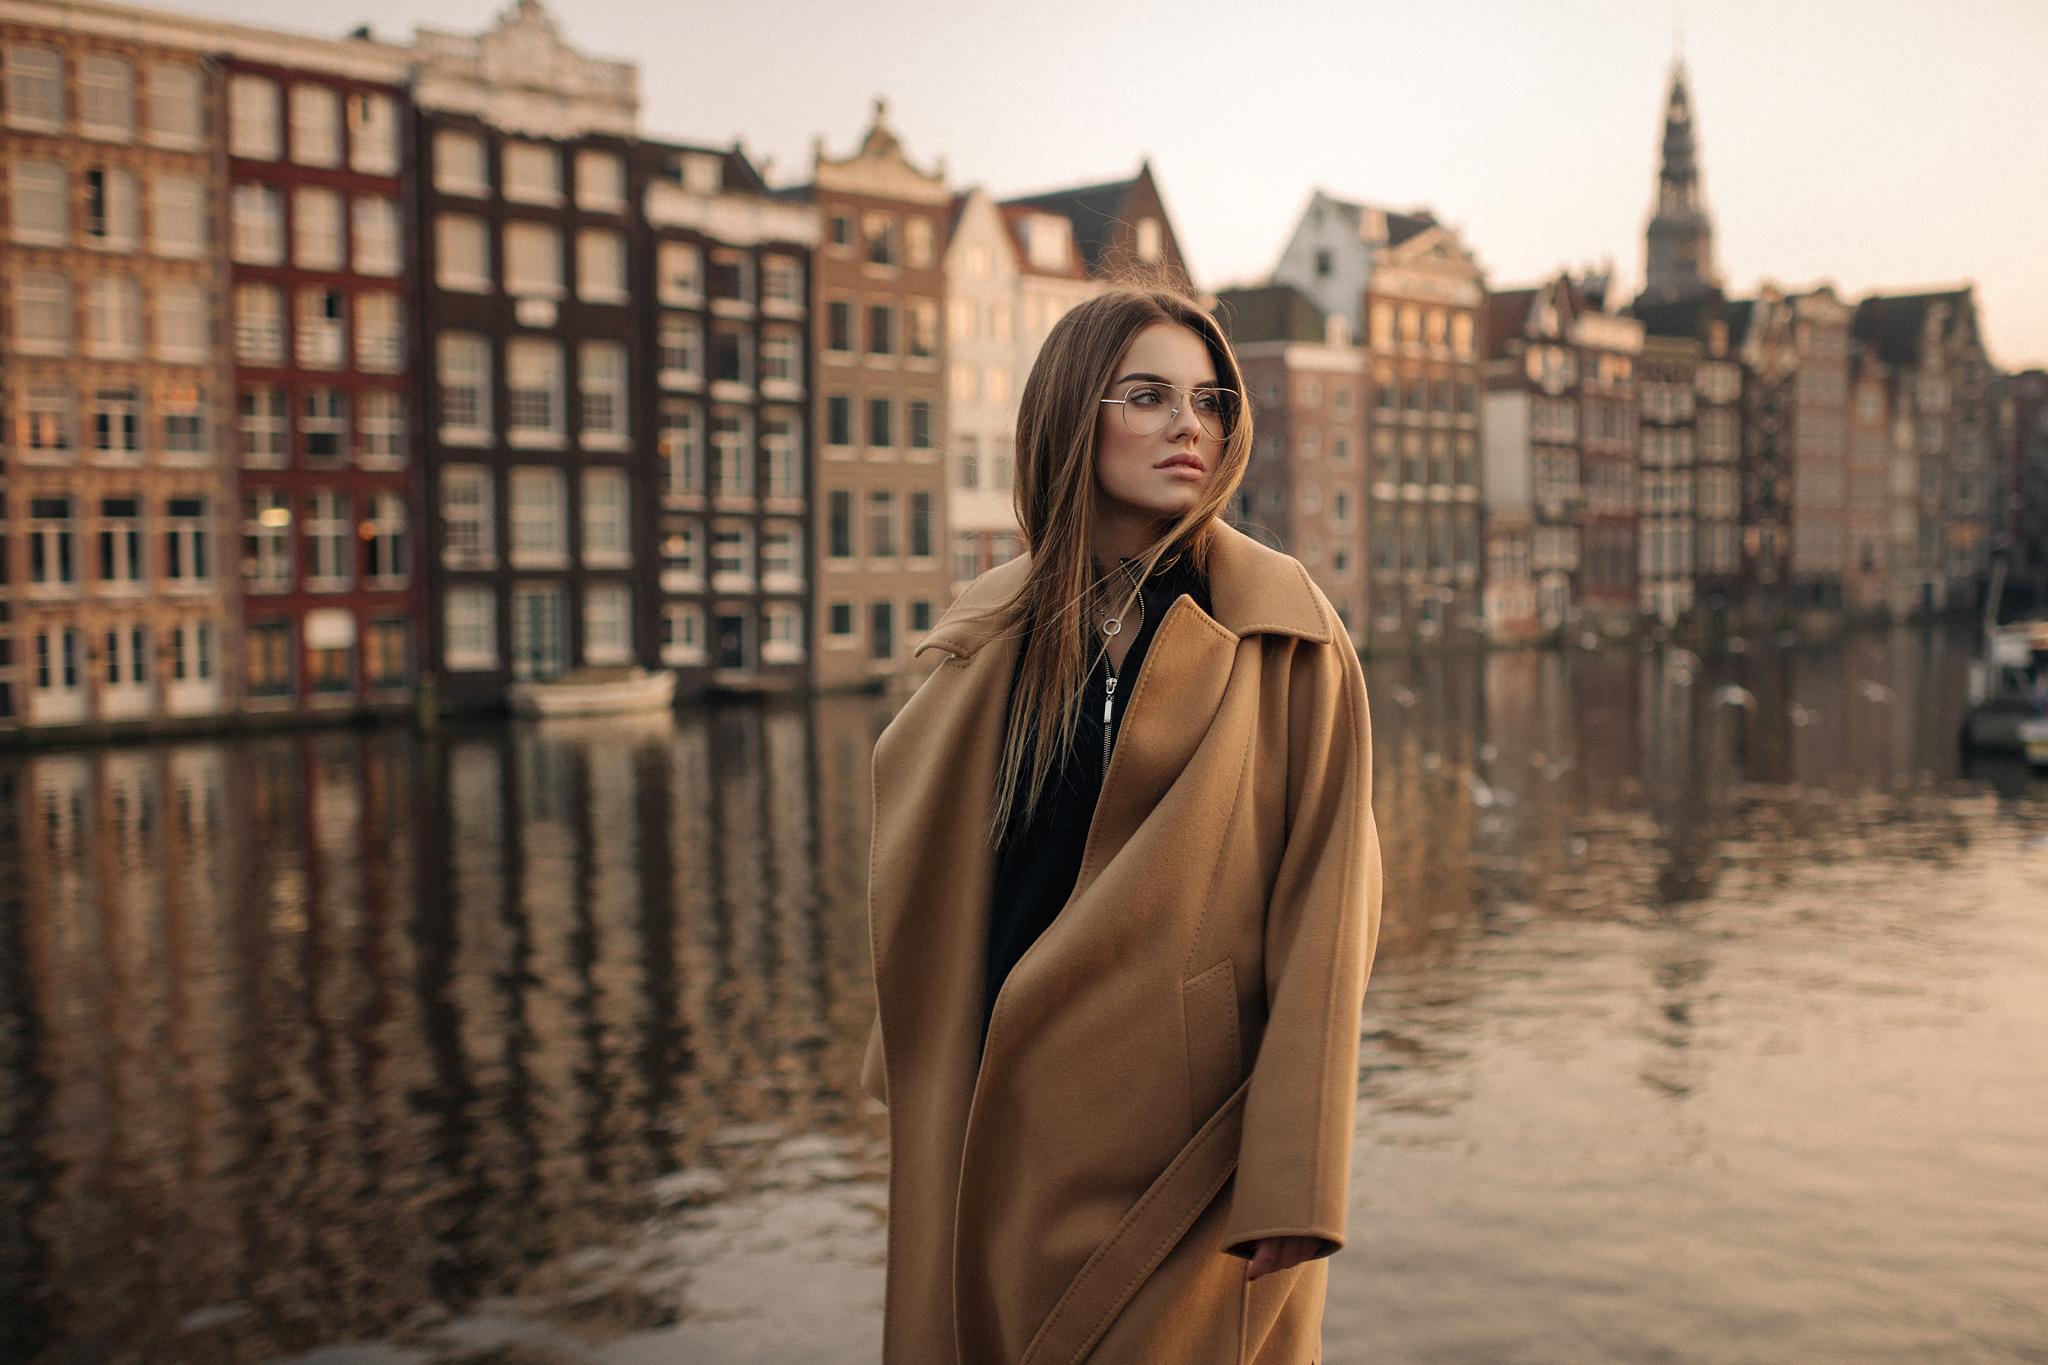 Portrait in Amsterdam